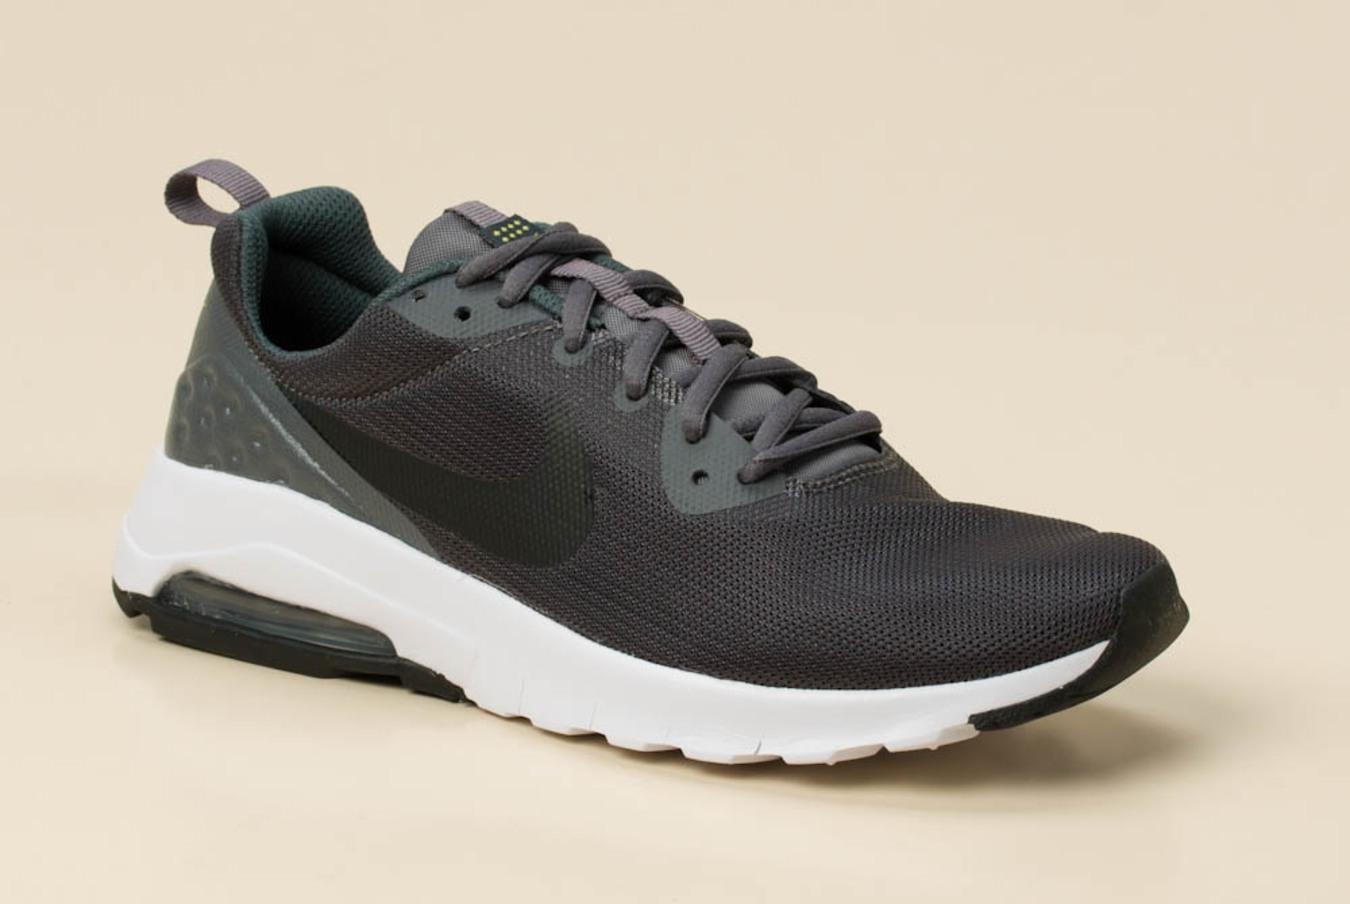 81ab44fca2b5b Nike Kinder Sneaker in dunkelgrau kaufen | Zumnorde Online-Shop